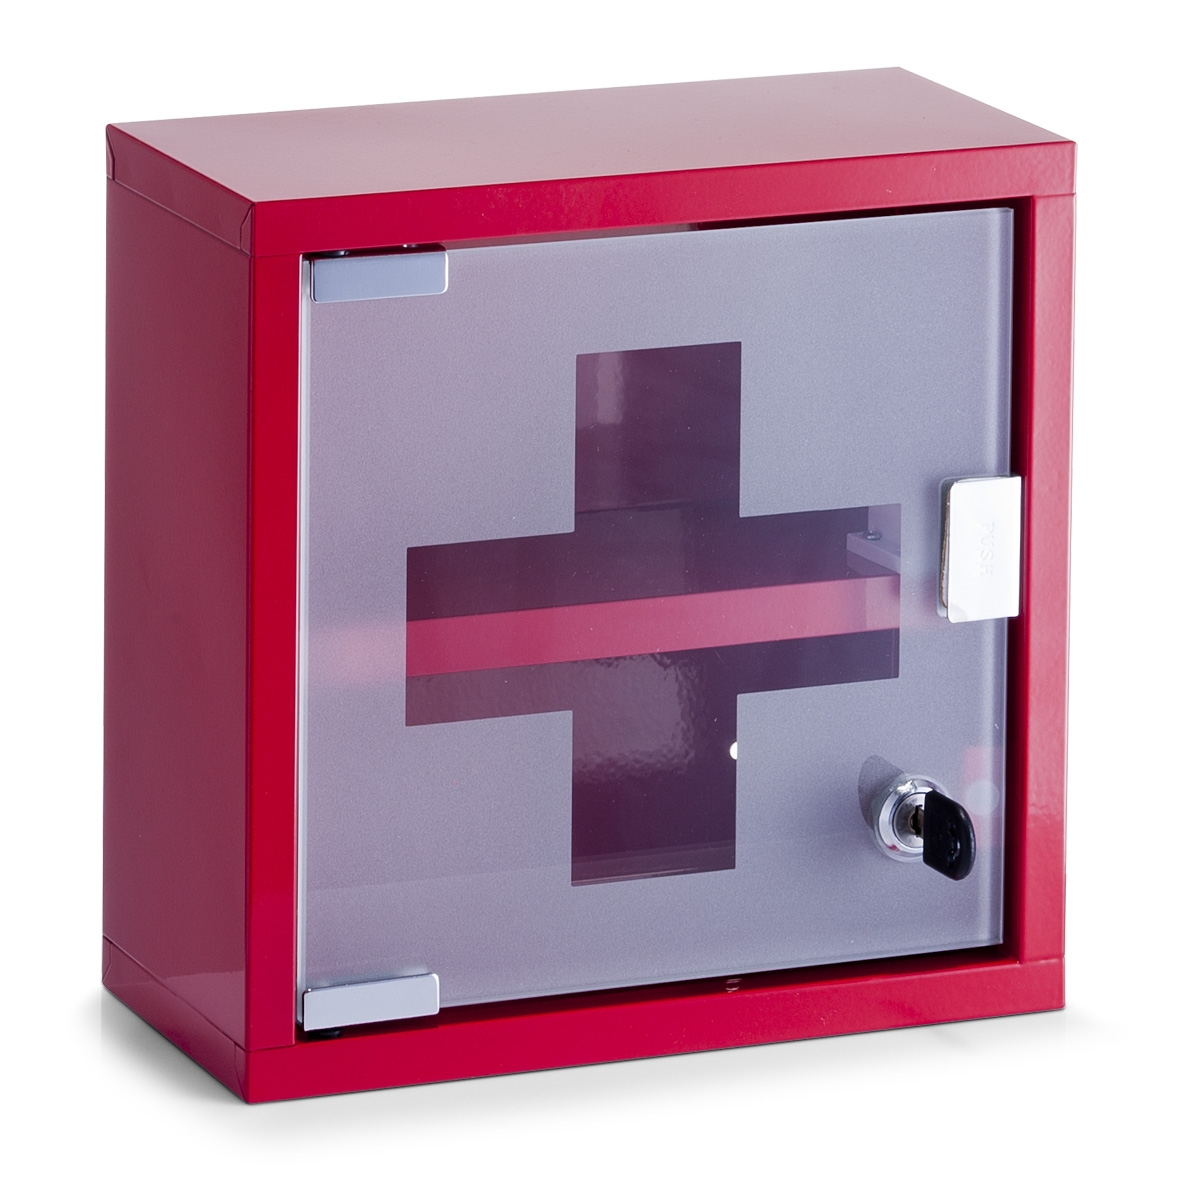 Dulap pentru medicamente, Metal Red, l25xA12xH25 cm imagine